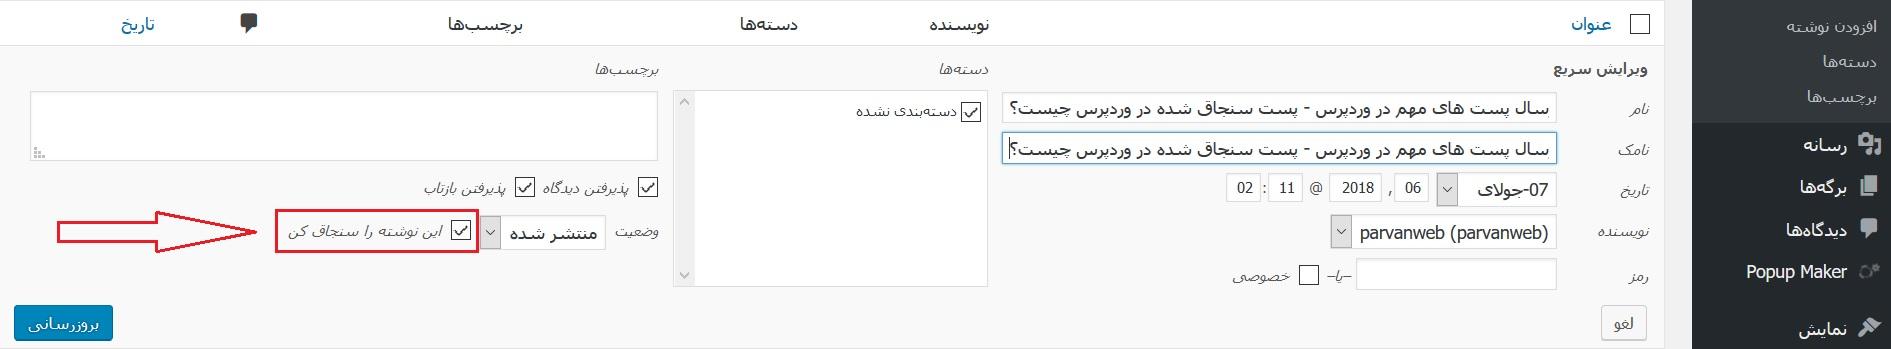 sanjagh - آموزش نحوه ارسال پست های مهم در وردپرس - پست سنجاق شده در وردپرس چیست؟